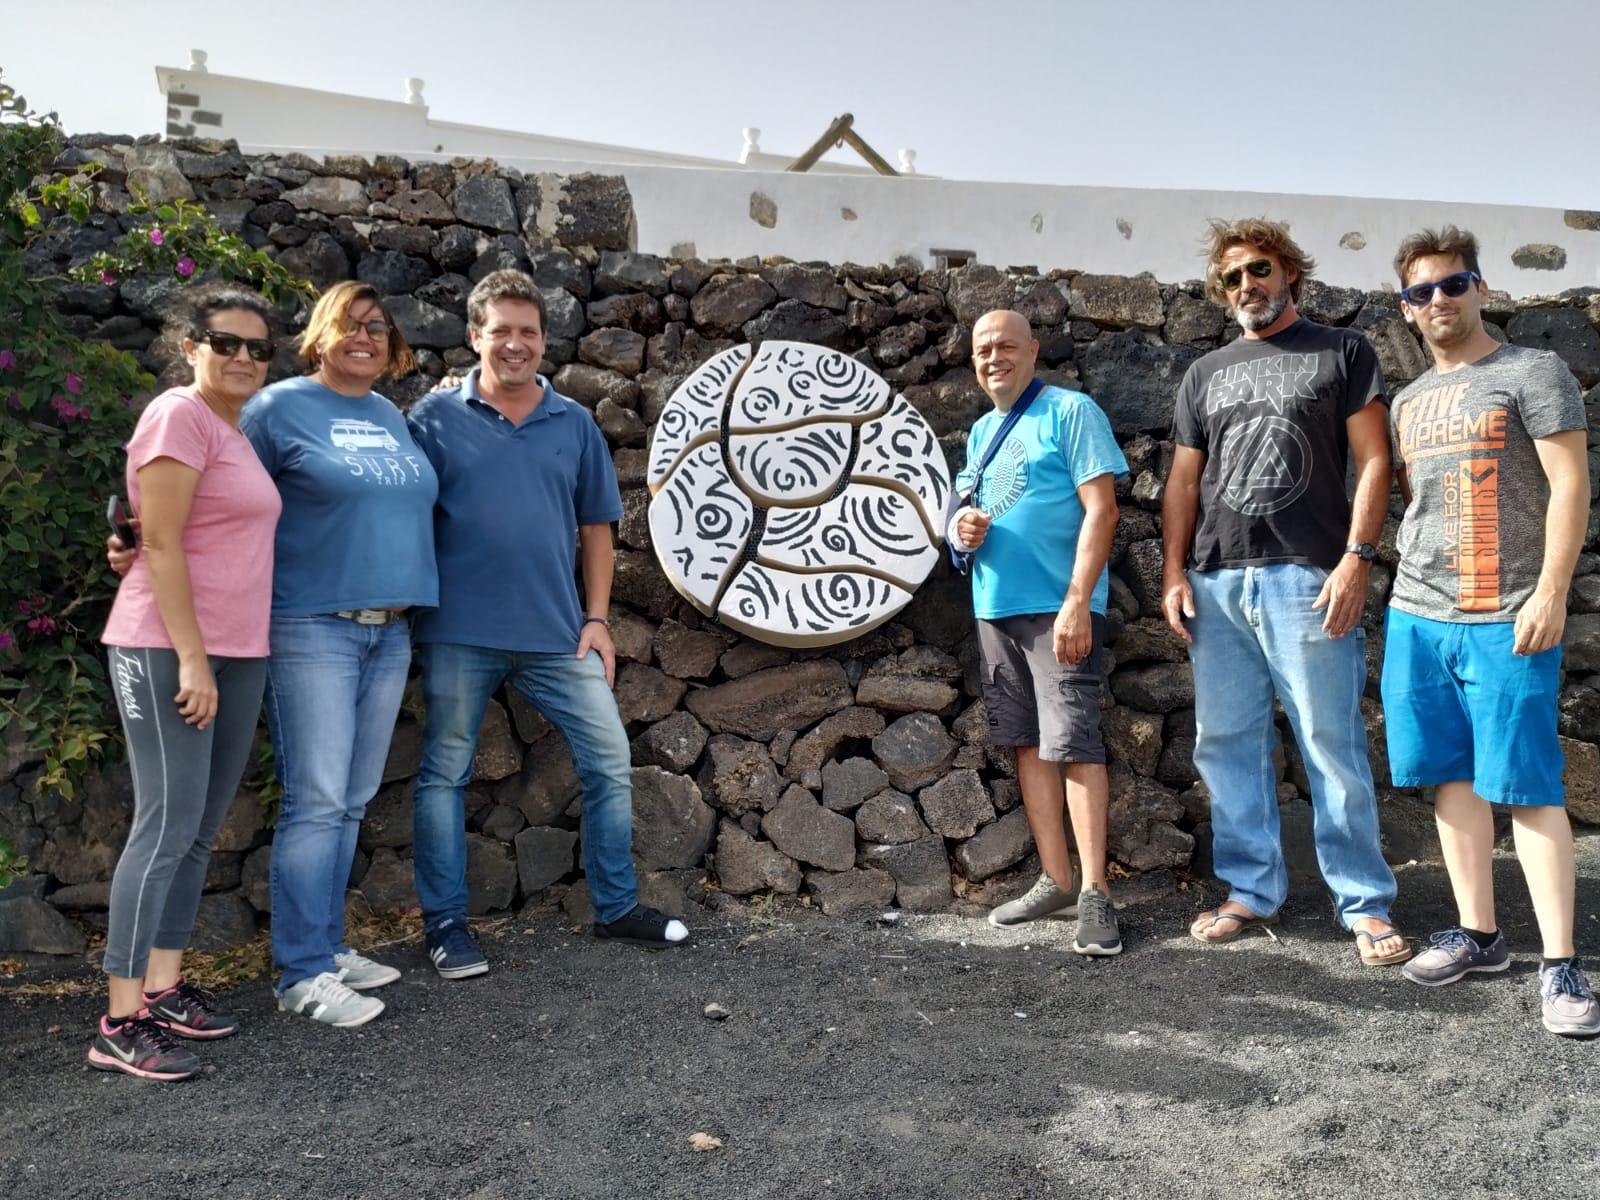 Arte y viticultura se funden en la escultura mural 'Soco' del Taller La Barrilla para Bodegas Vega de Yuco-Finca Testeina